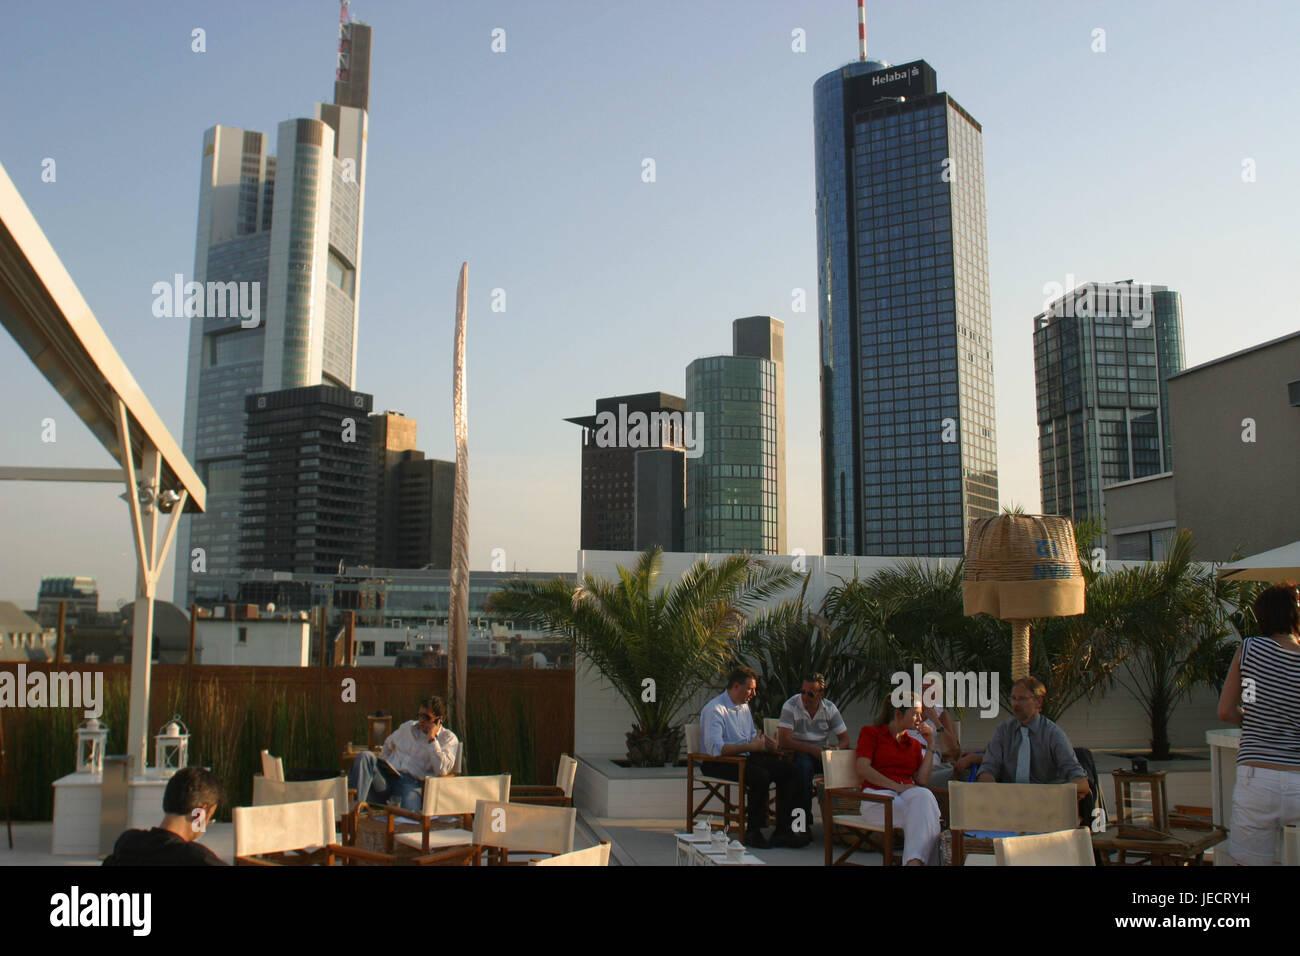 Germany, Hessen, Frankfurt on the Main, roof terrace, skyline, stage bar, bank fourth, Main metropolis, sunshades, - Stock Image